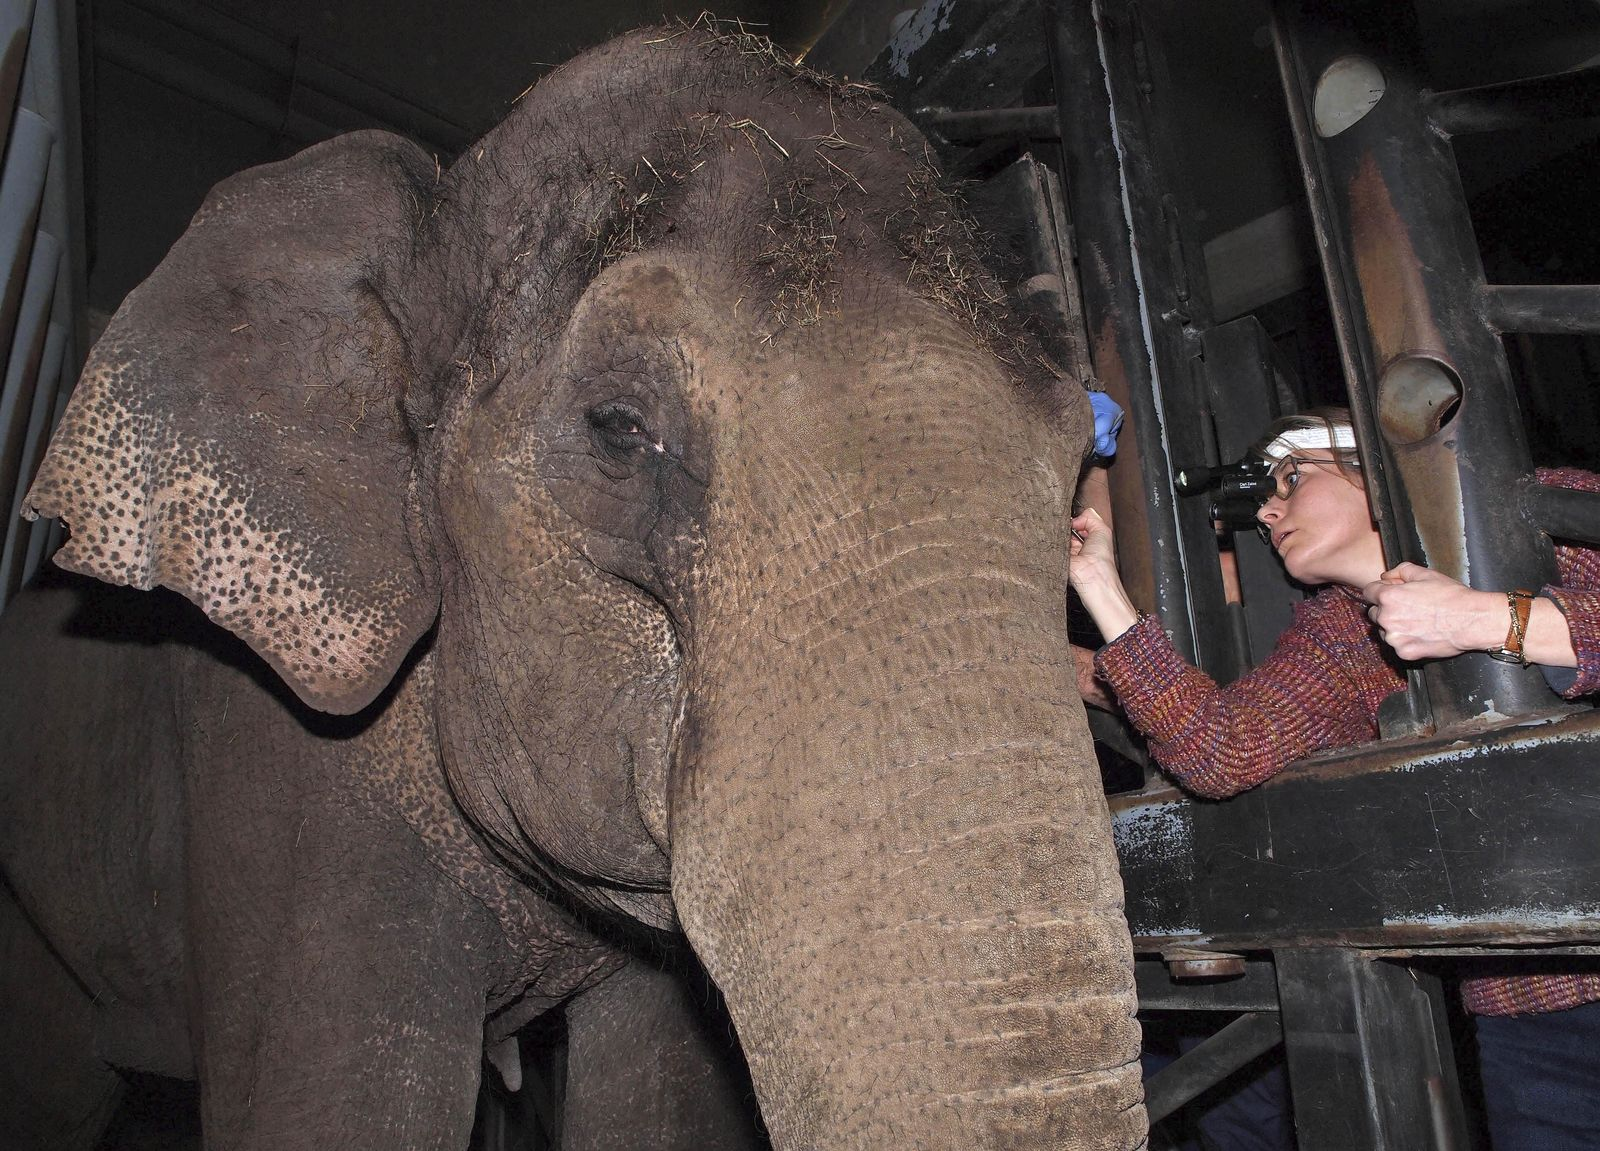 Niederlande/ Kontaktlinsen für Elefant